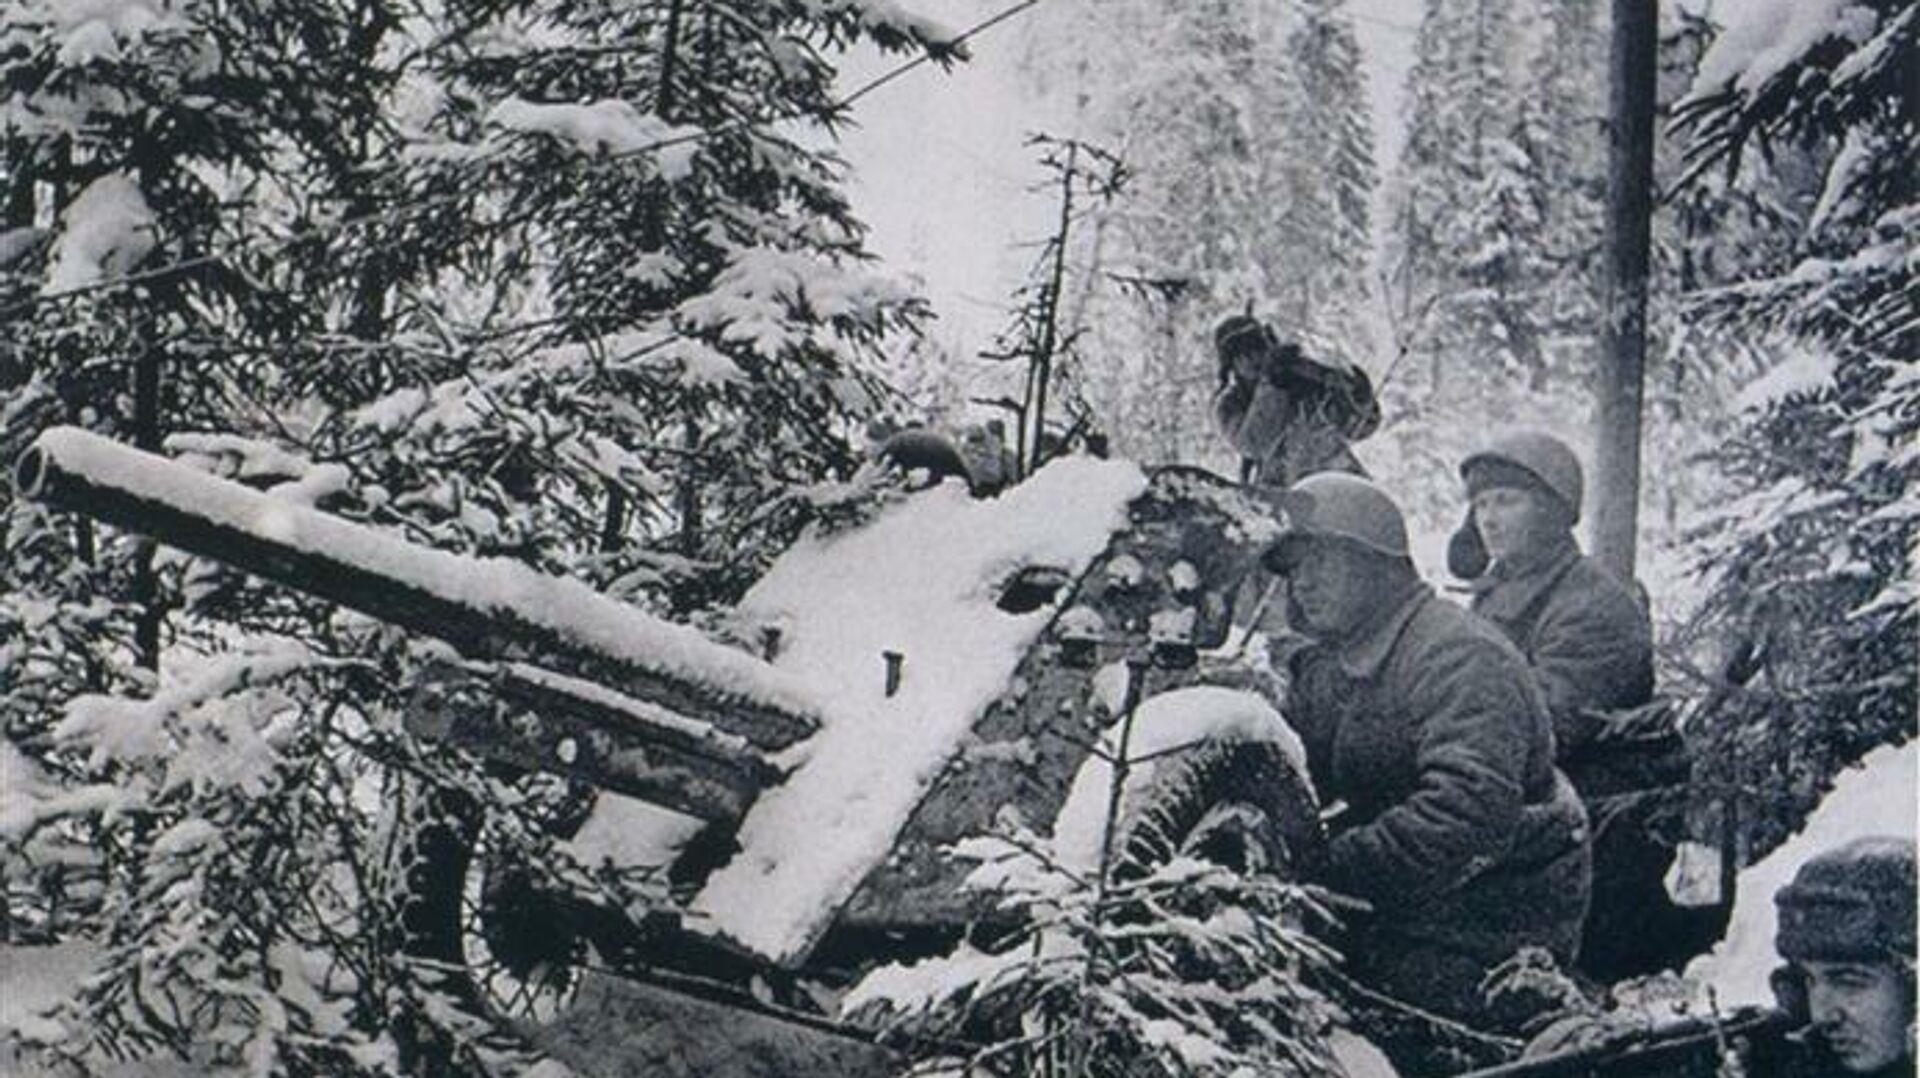 Битва за Москву осенью 1941 года - РИА Новости, 1920, 11.05.2021